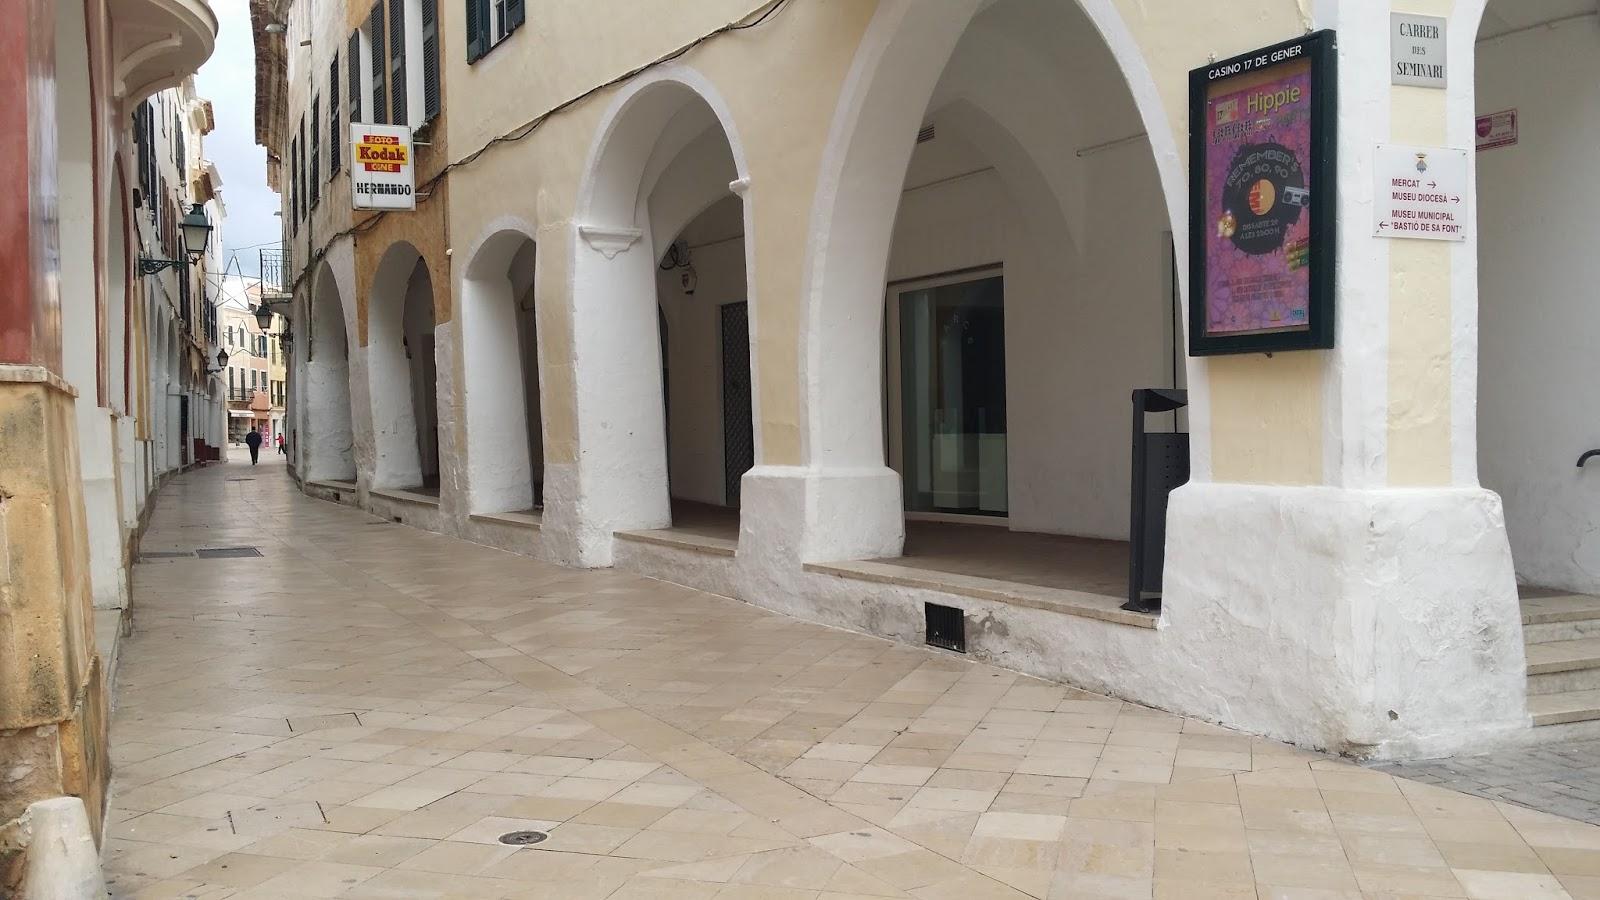 nekanen designs: Ciutadella de Menorca. Blogger traveller